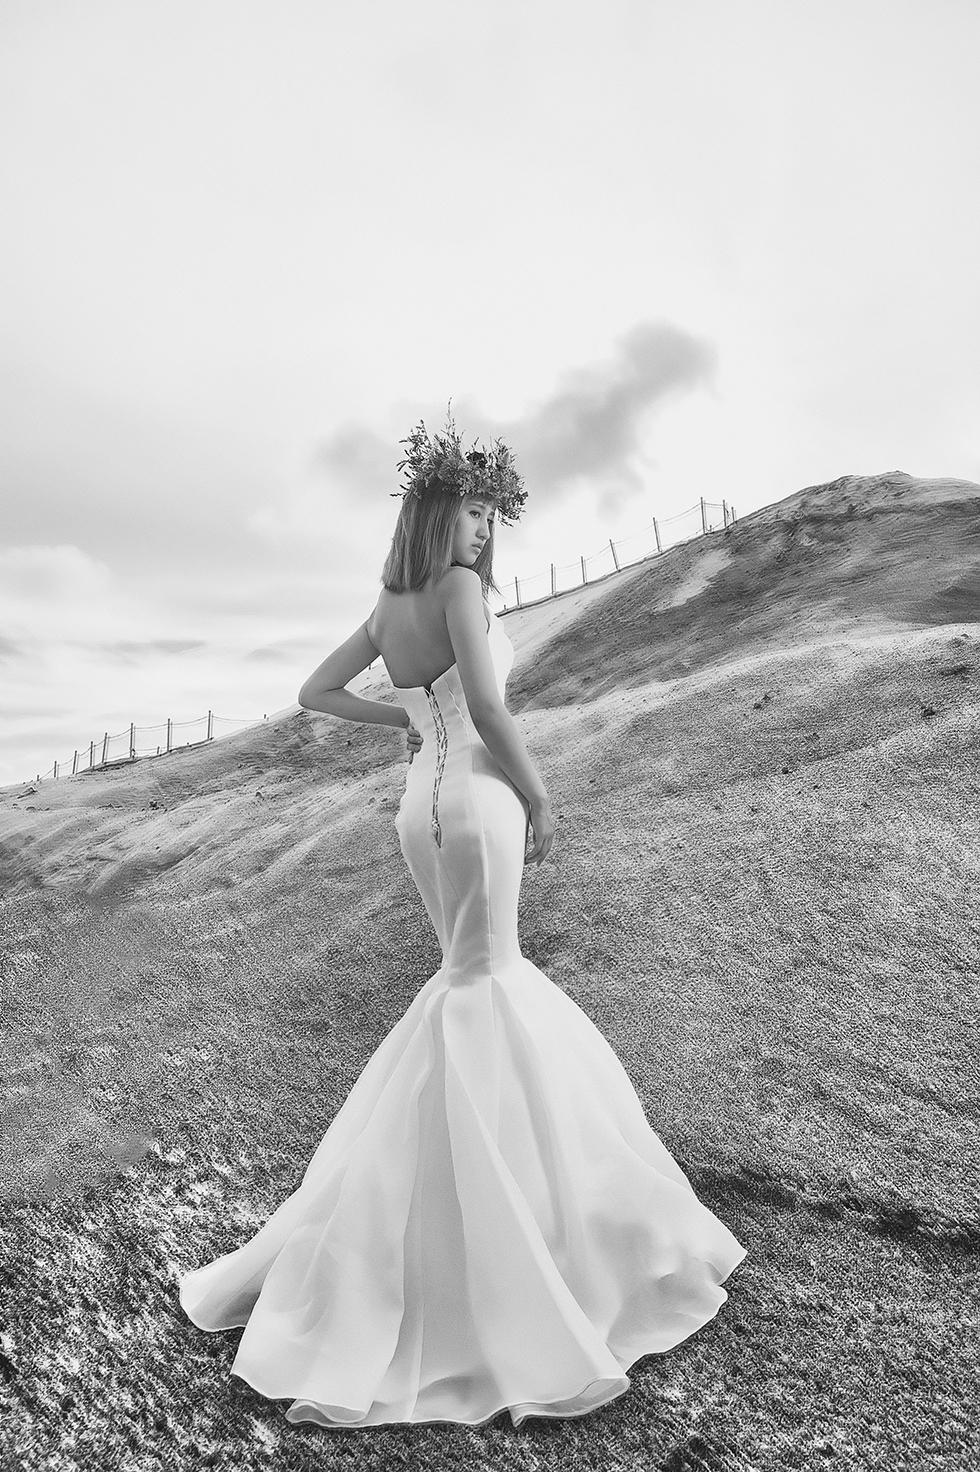 DSC_0994- 婚攝, 婚禮攝影, 婚紗包套, 婚禮紀錄, 親子寫真, 美式婚紗攝影, 自助婚紗, 小資婚紗, 婚攝推薦, 家庭寫真, 孕婦寫真, 顏氏牧場婚攝, 林酒店婚攝, 萊特薇庭婚攝, 婚攝推薦, 婚紗婚攝, 婚紗攝影, 婚禮攝影推薦, 自助婚紗